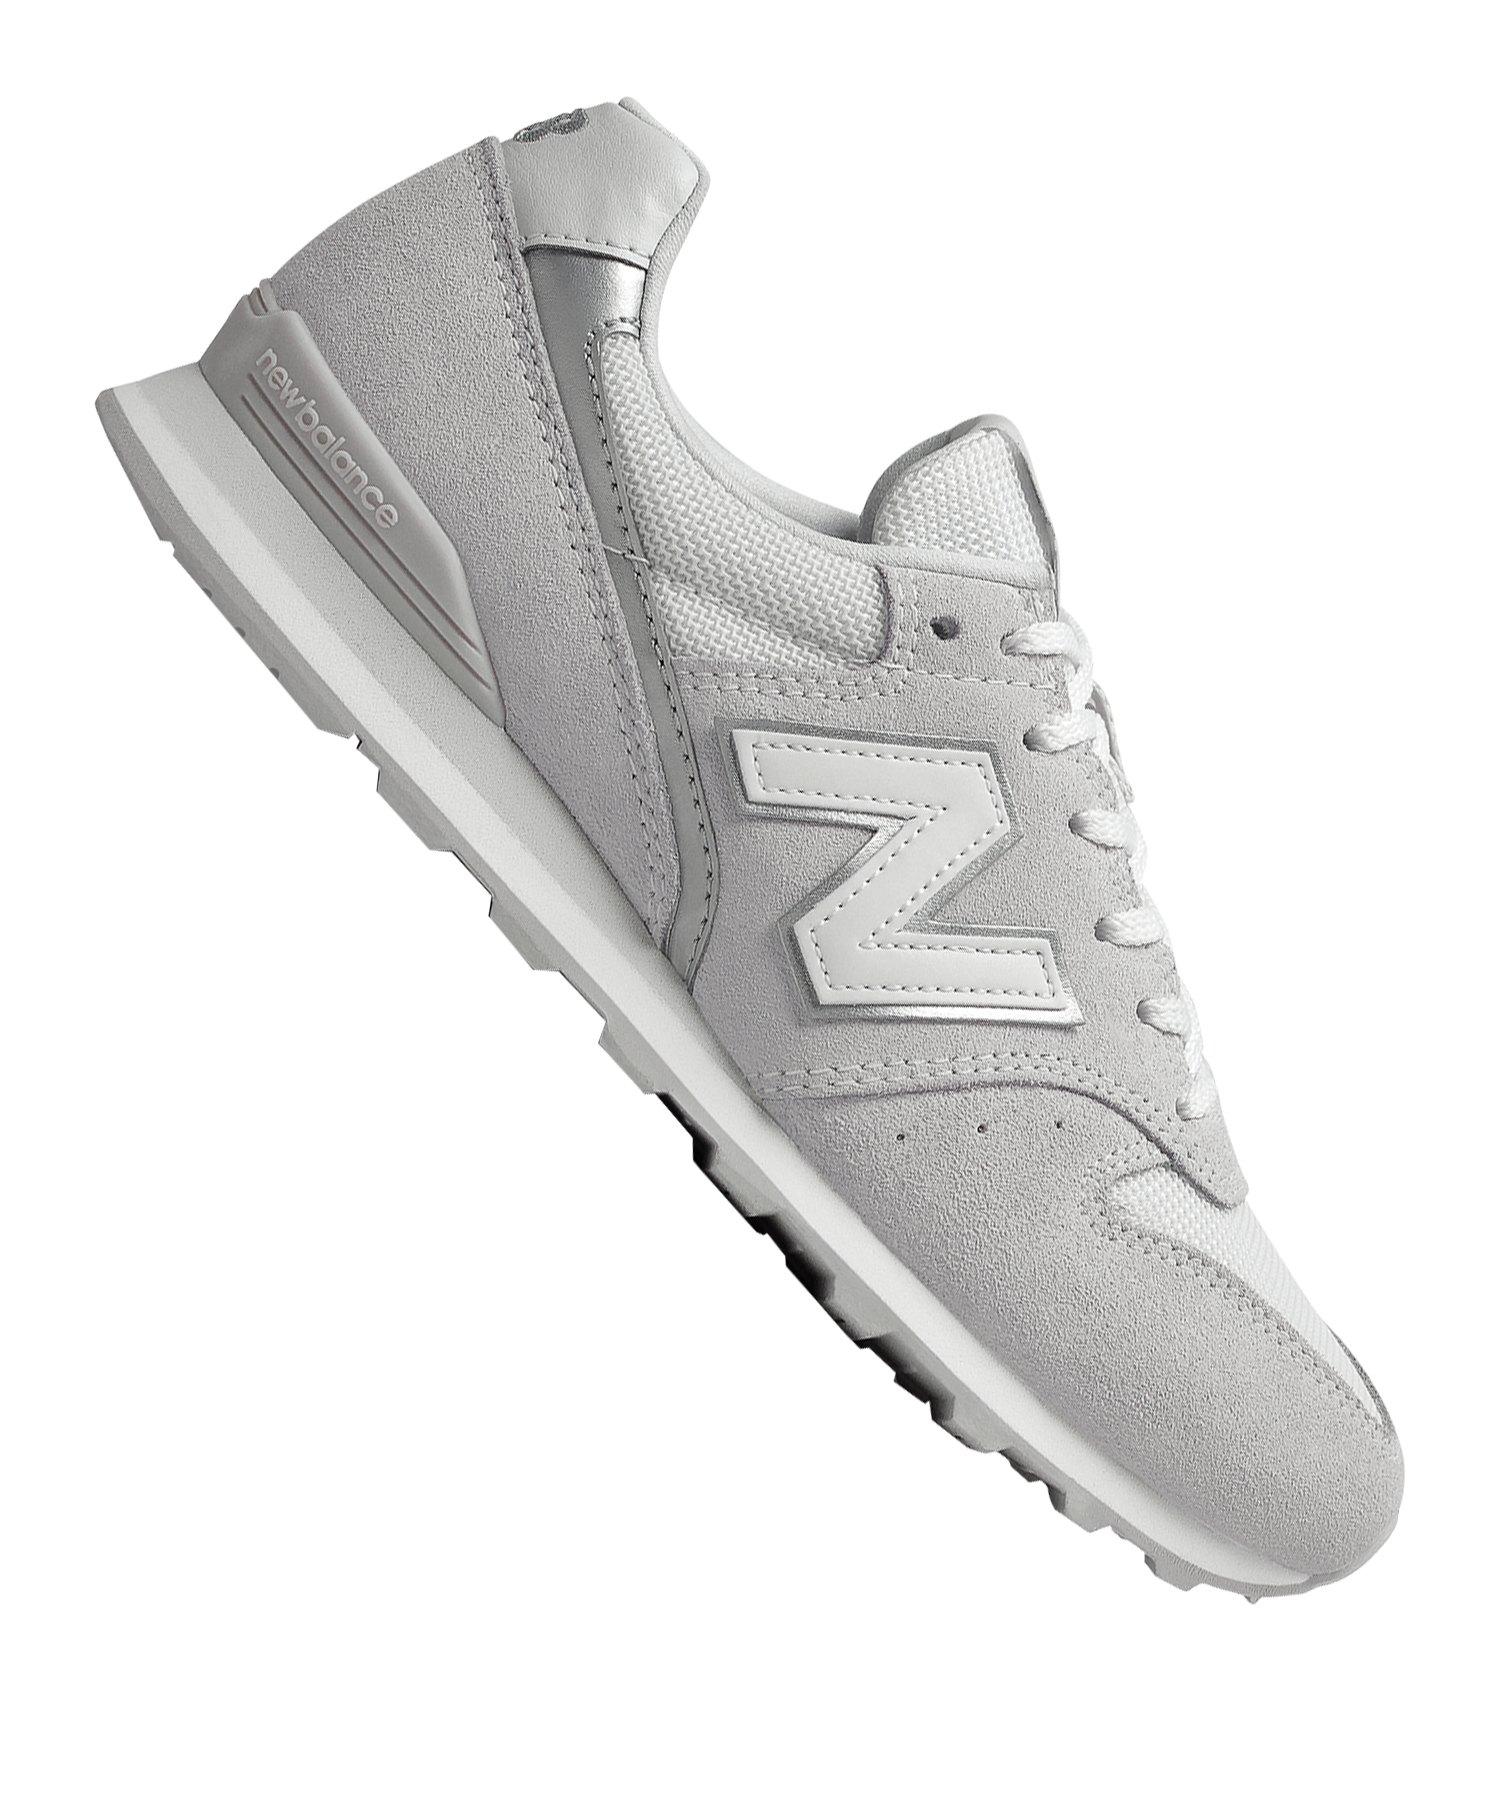 huge selection of 85b34 69f09 New Balance WL996 B Sneaker Damen Grau F11